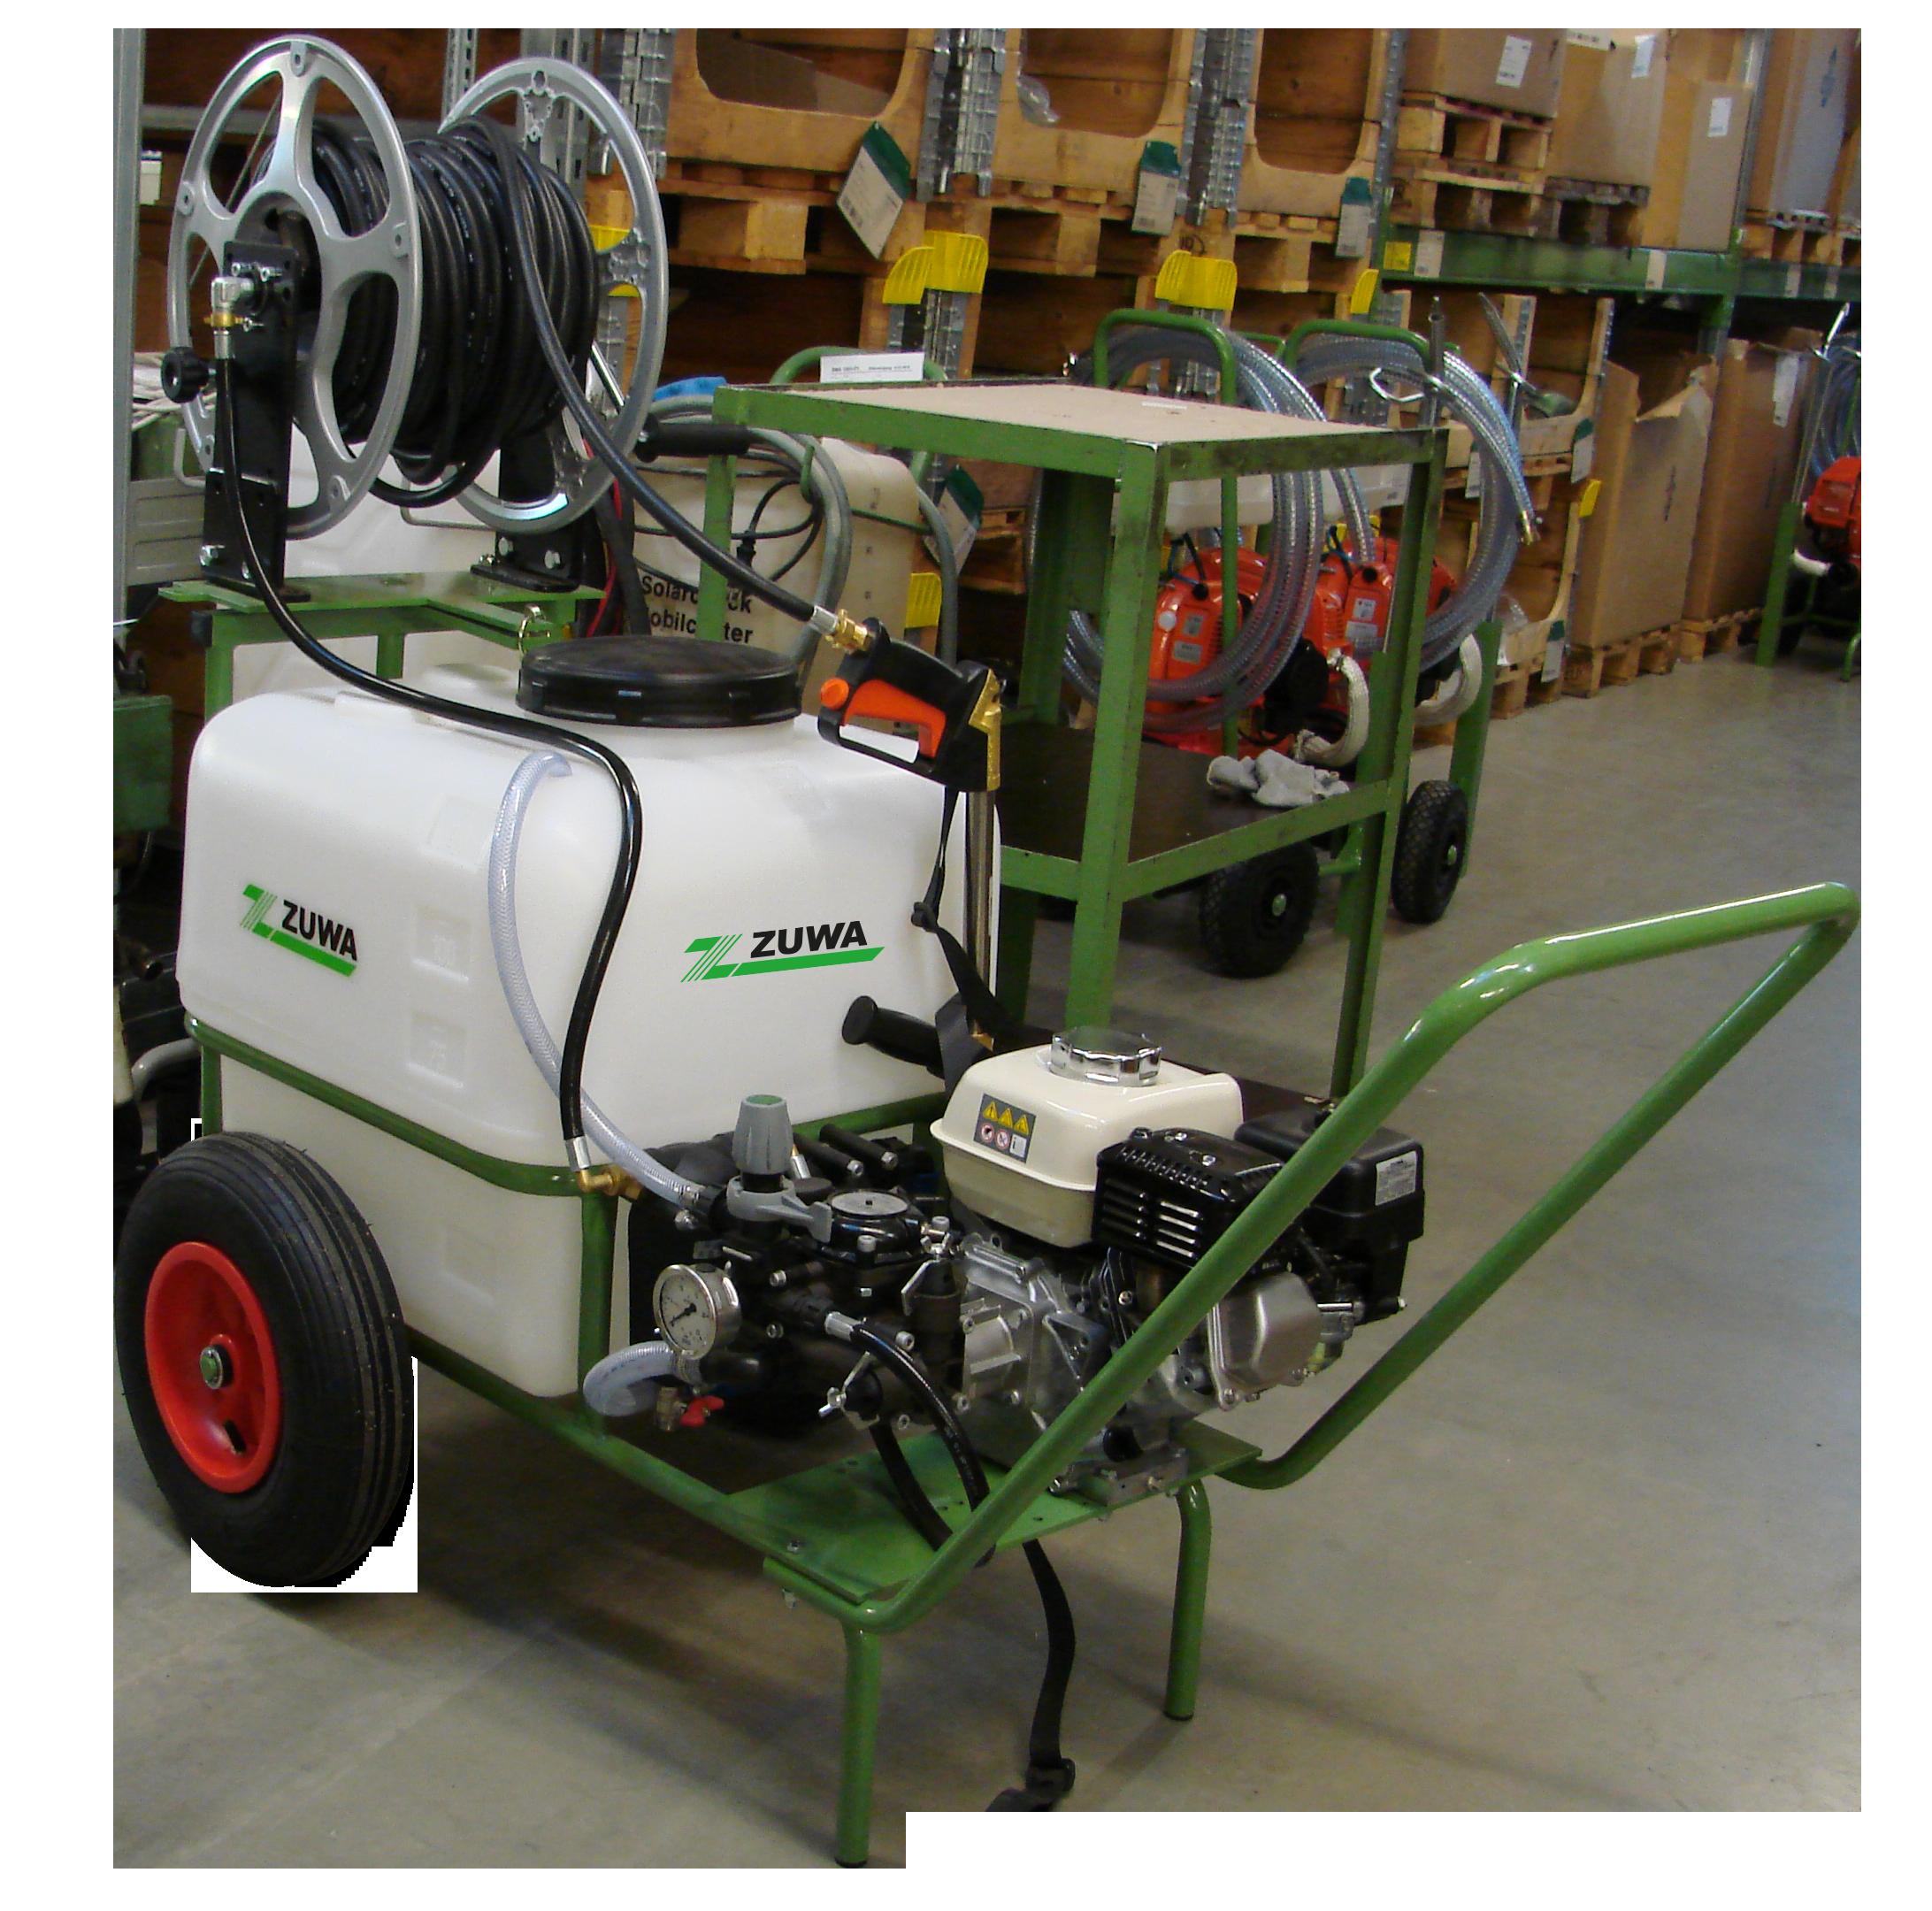 cart sprayer F-120 | ZUWA-Zumpe GmbH